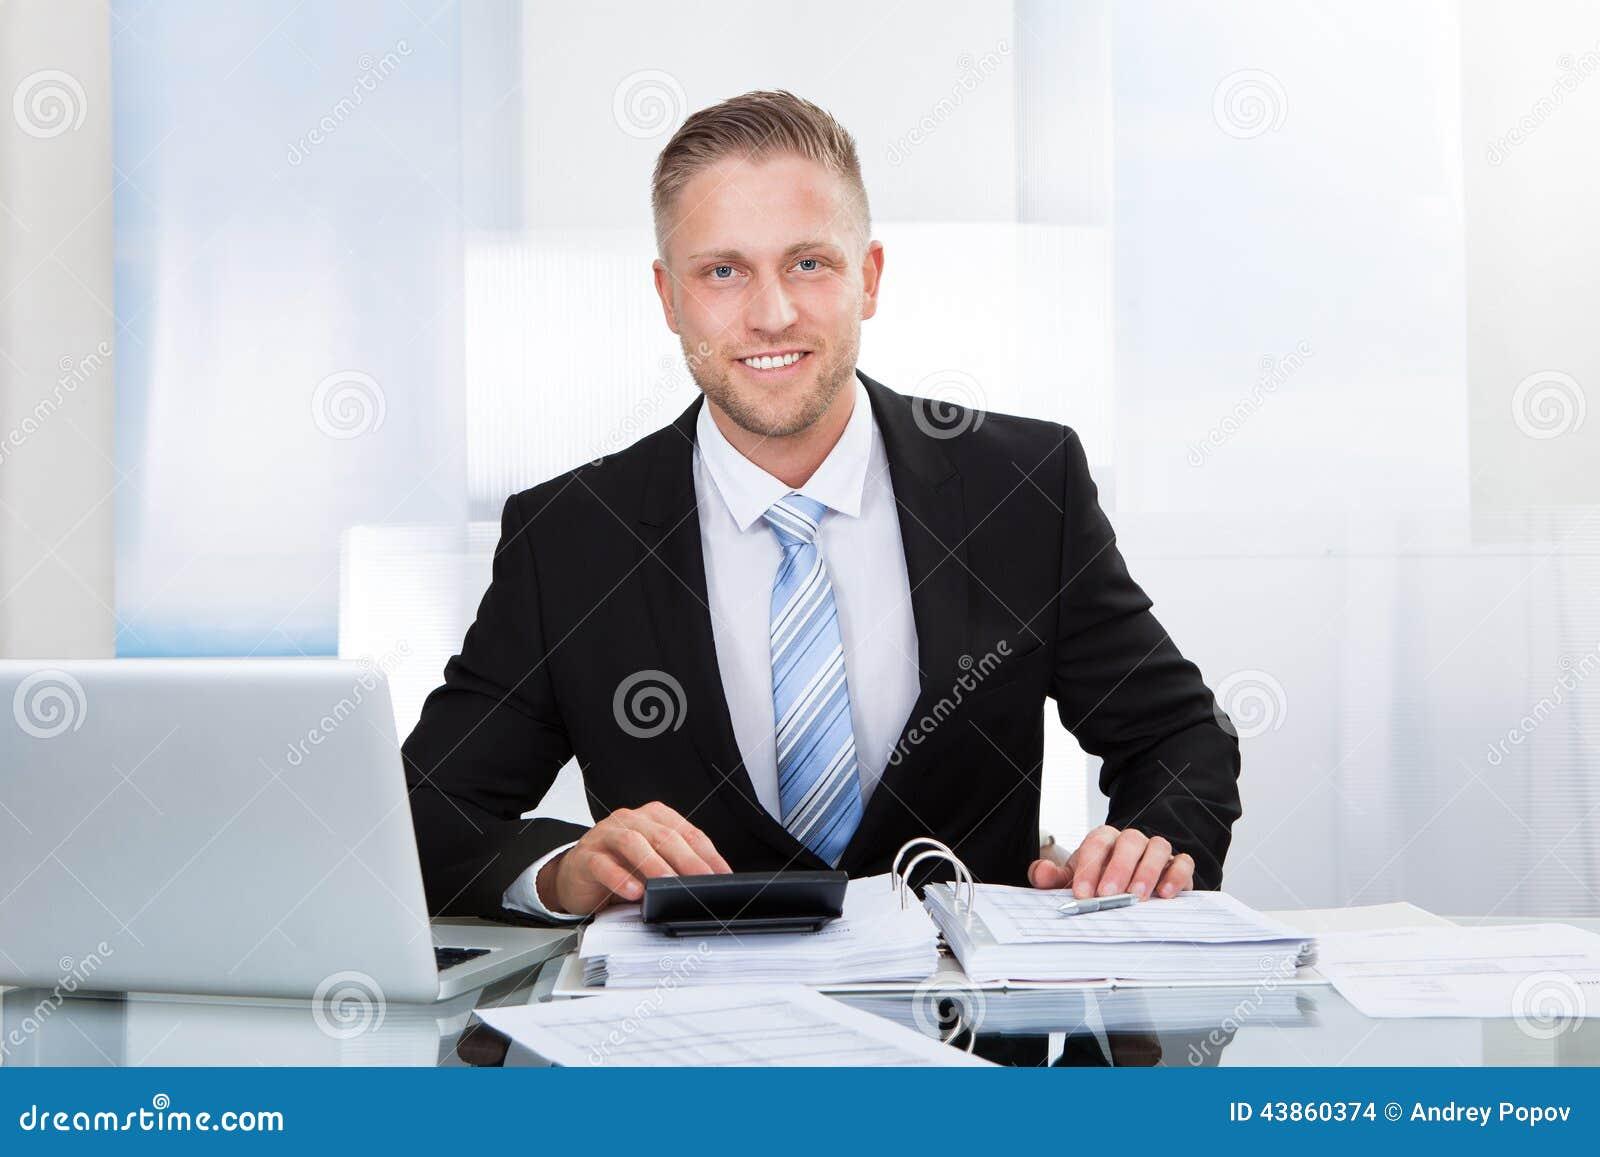 Smiling successful businessman st his desk